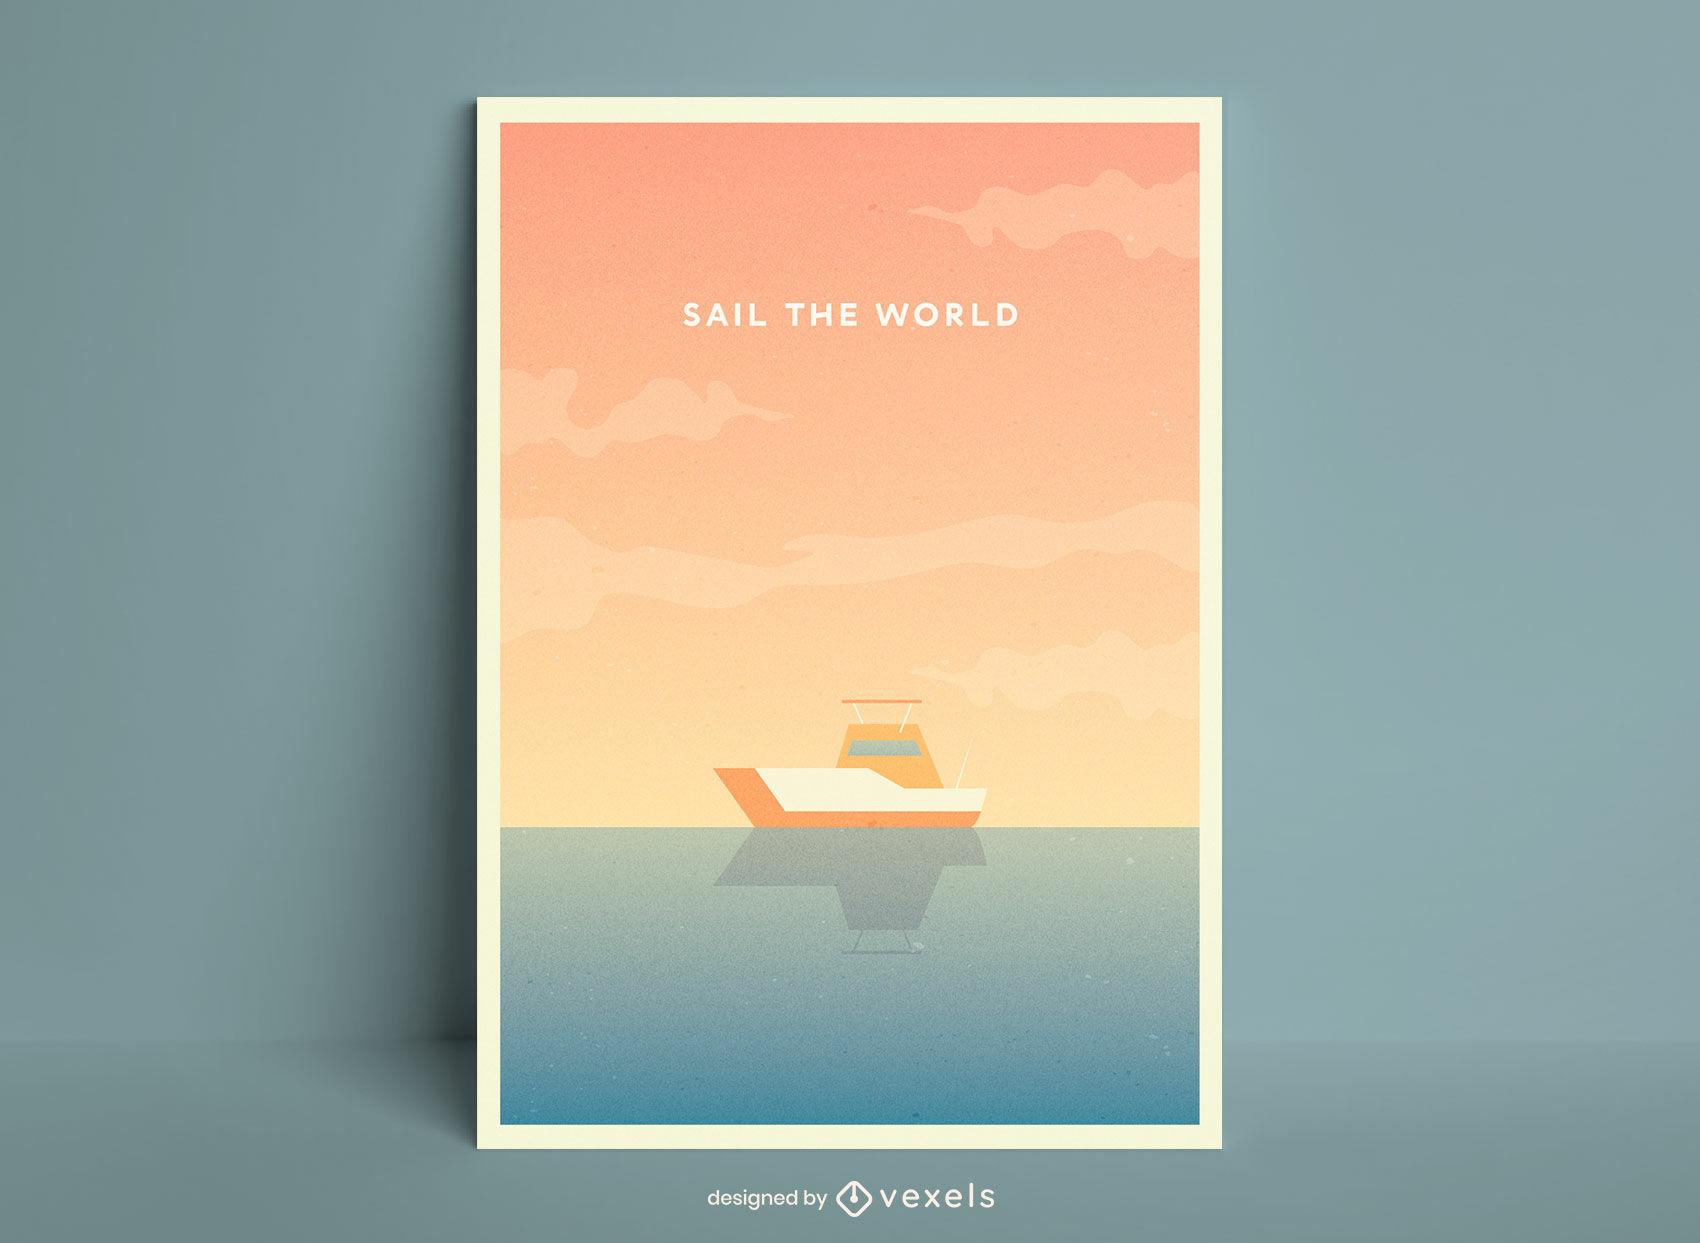 Sailing boat illustration poster